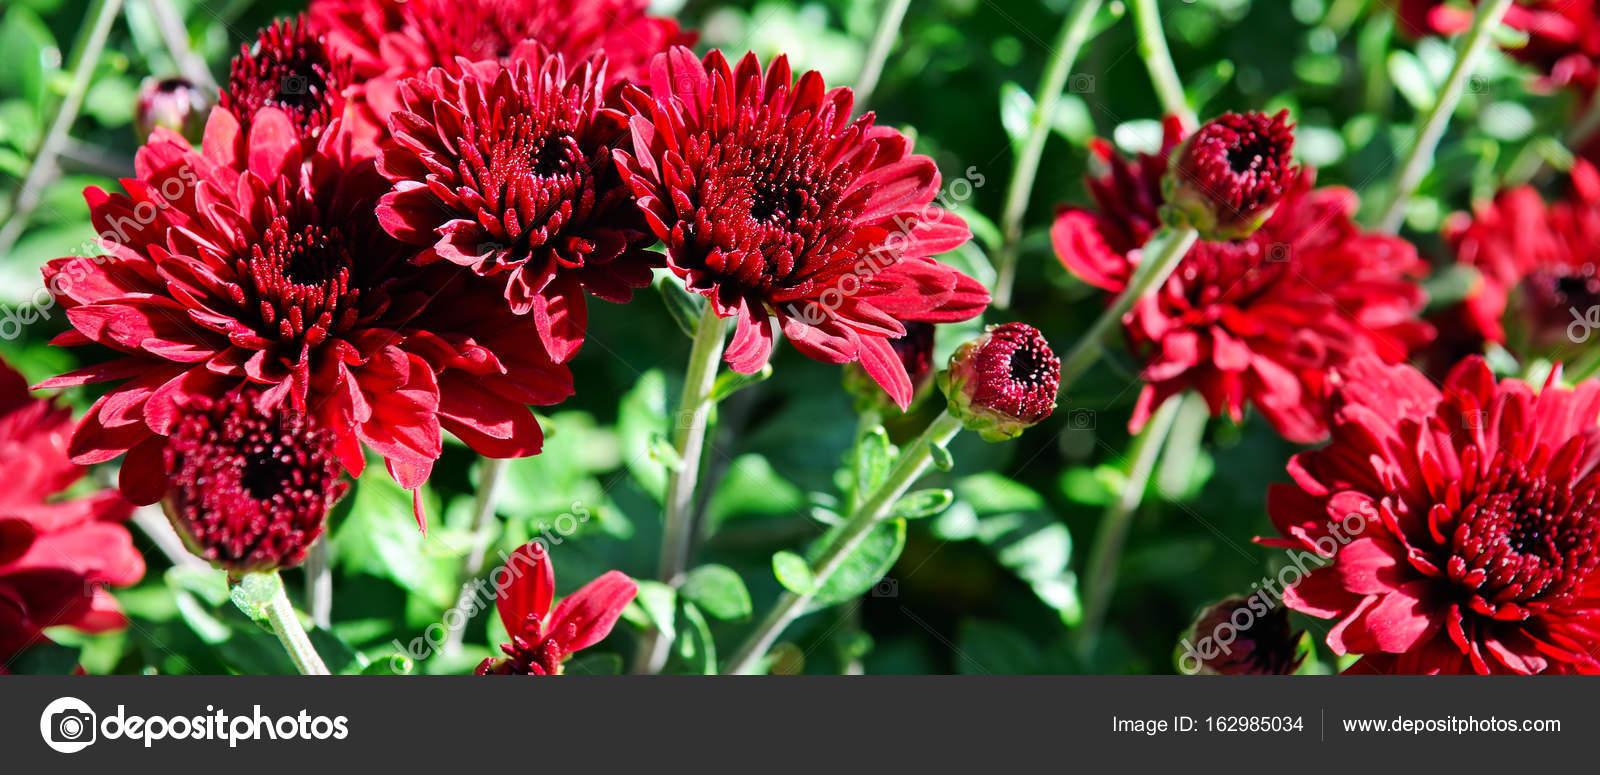 Background of bright garden flowers stock photo alinamd 162985034 background of bright garden flowers stock photo izmirmasajfo